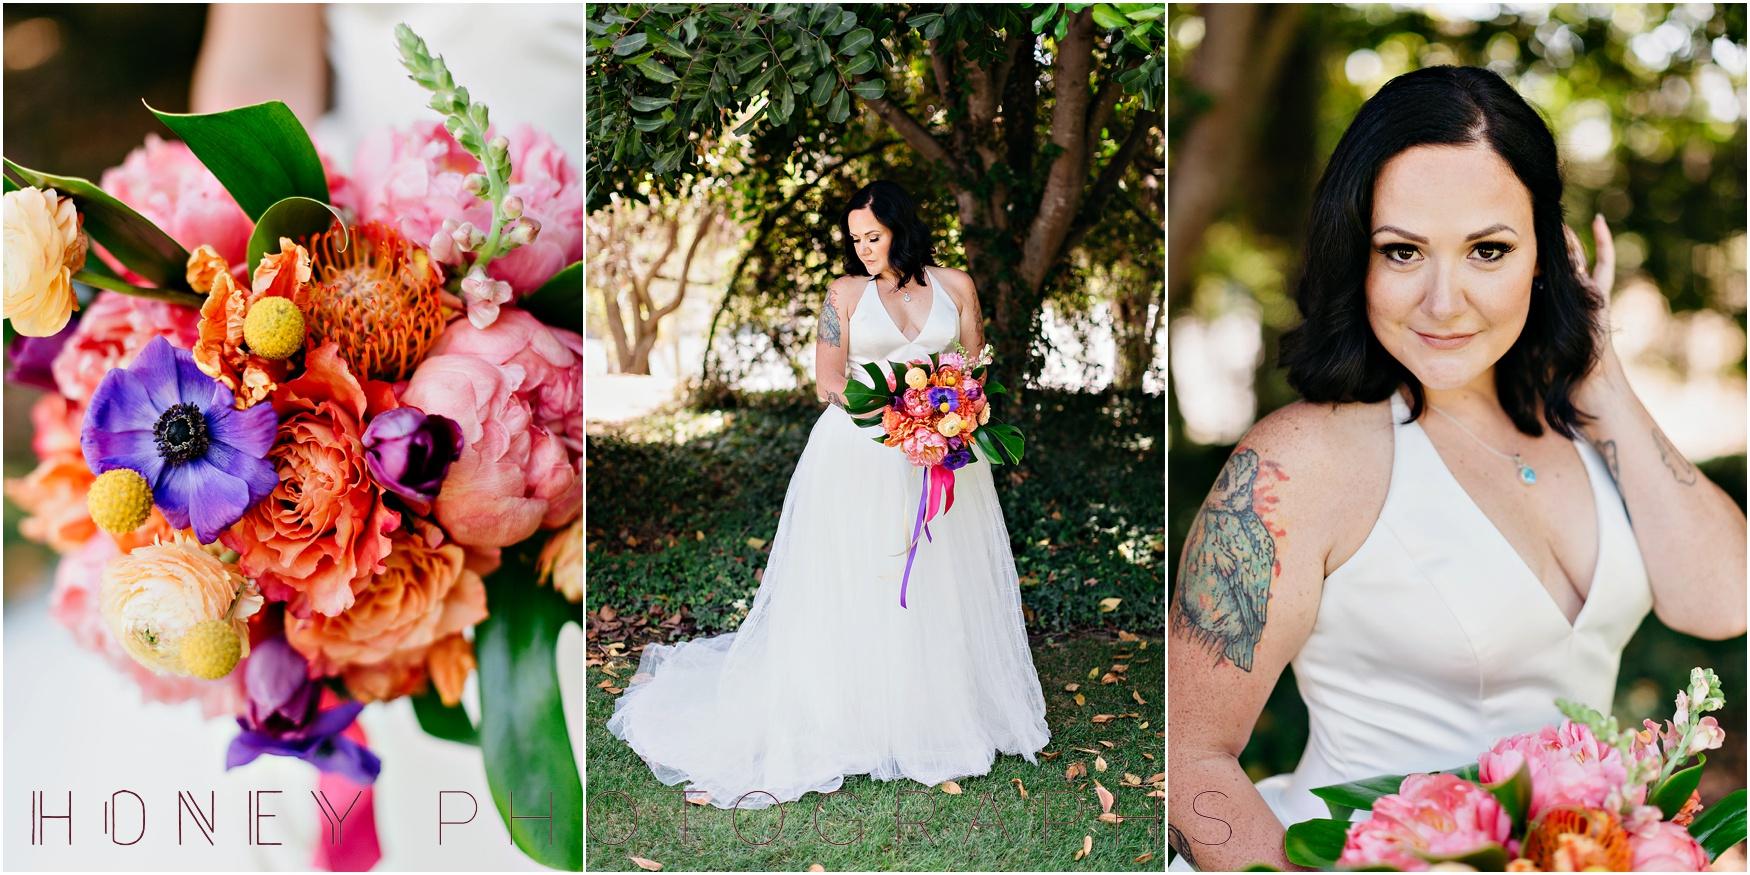 colorful_ecclectic_vibrant_vista_rainbow_quirky_wedding031.jpg